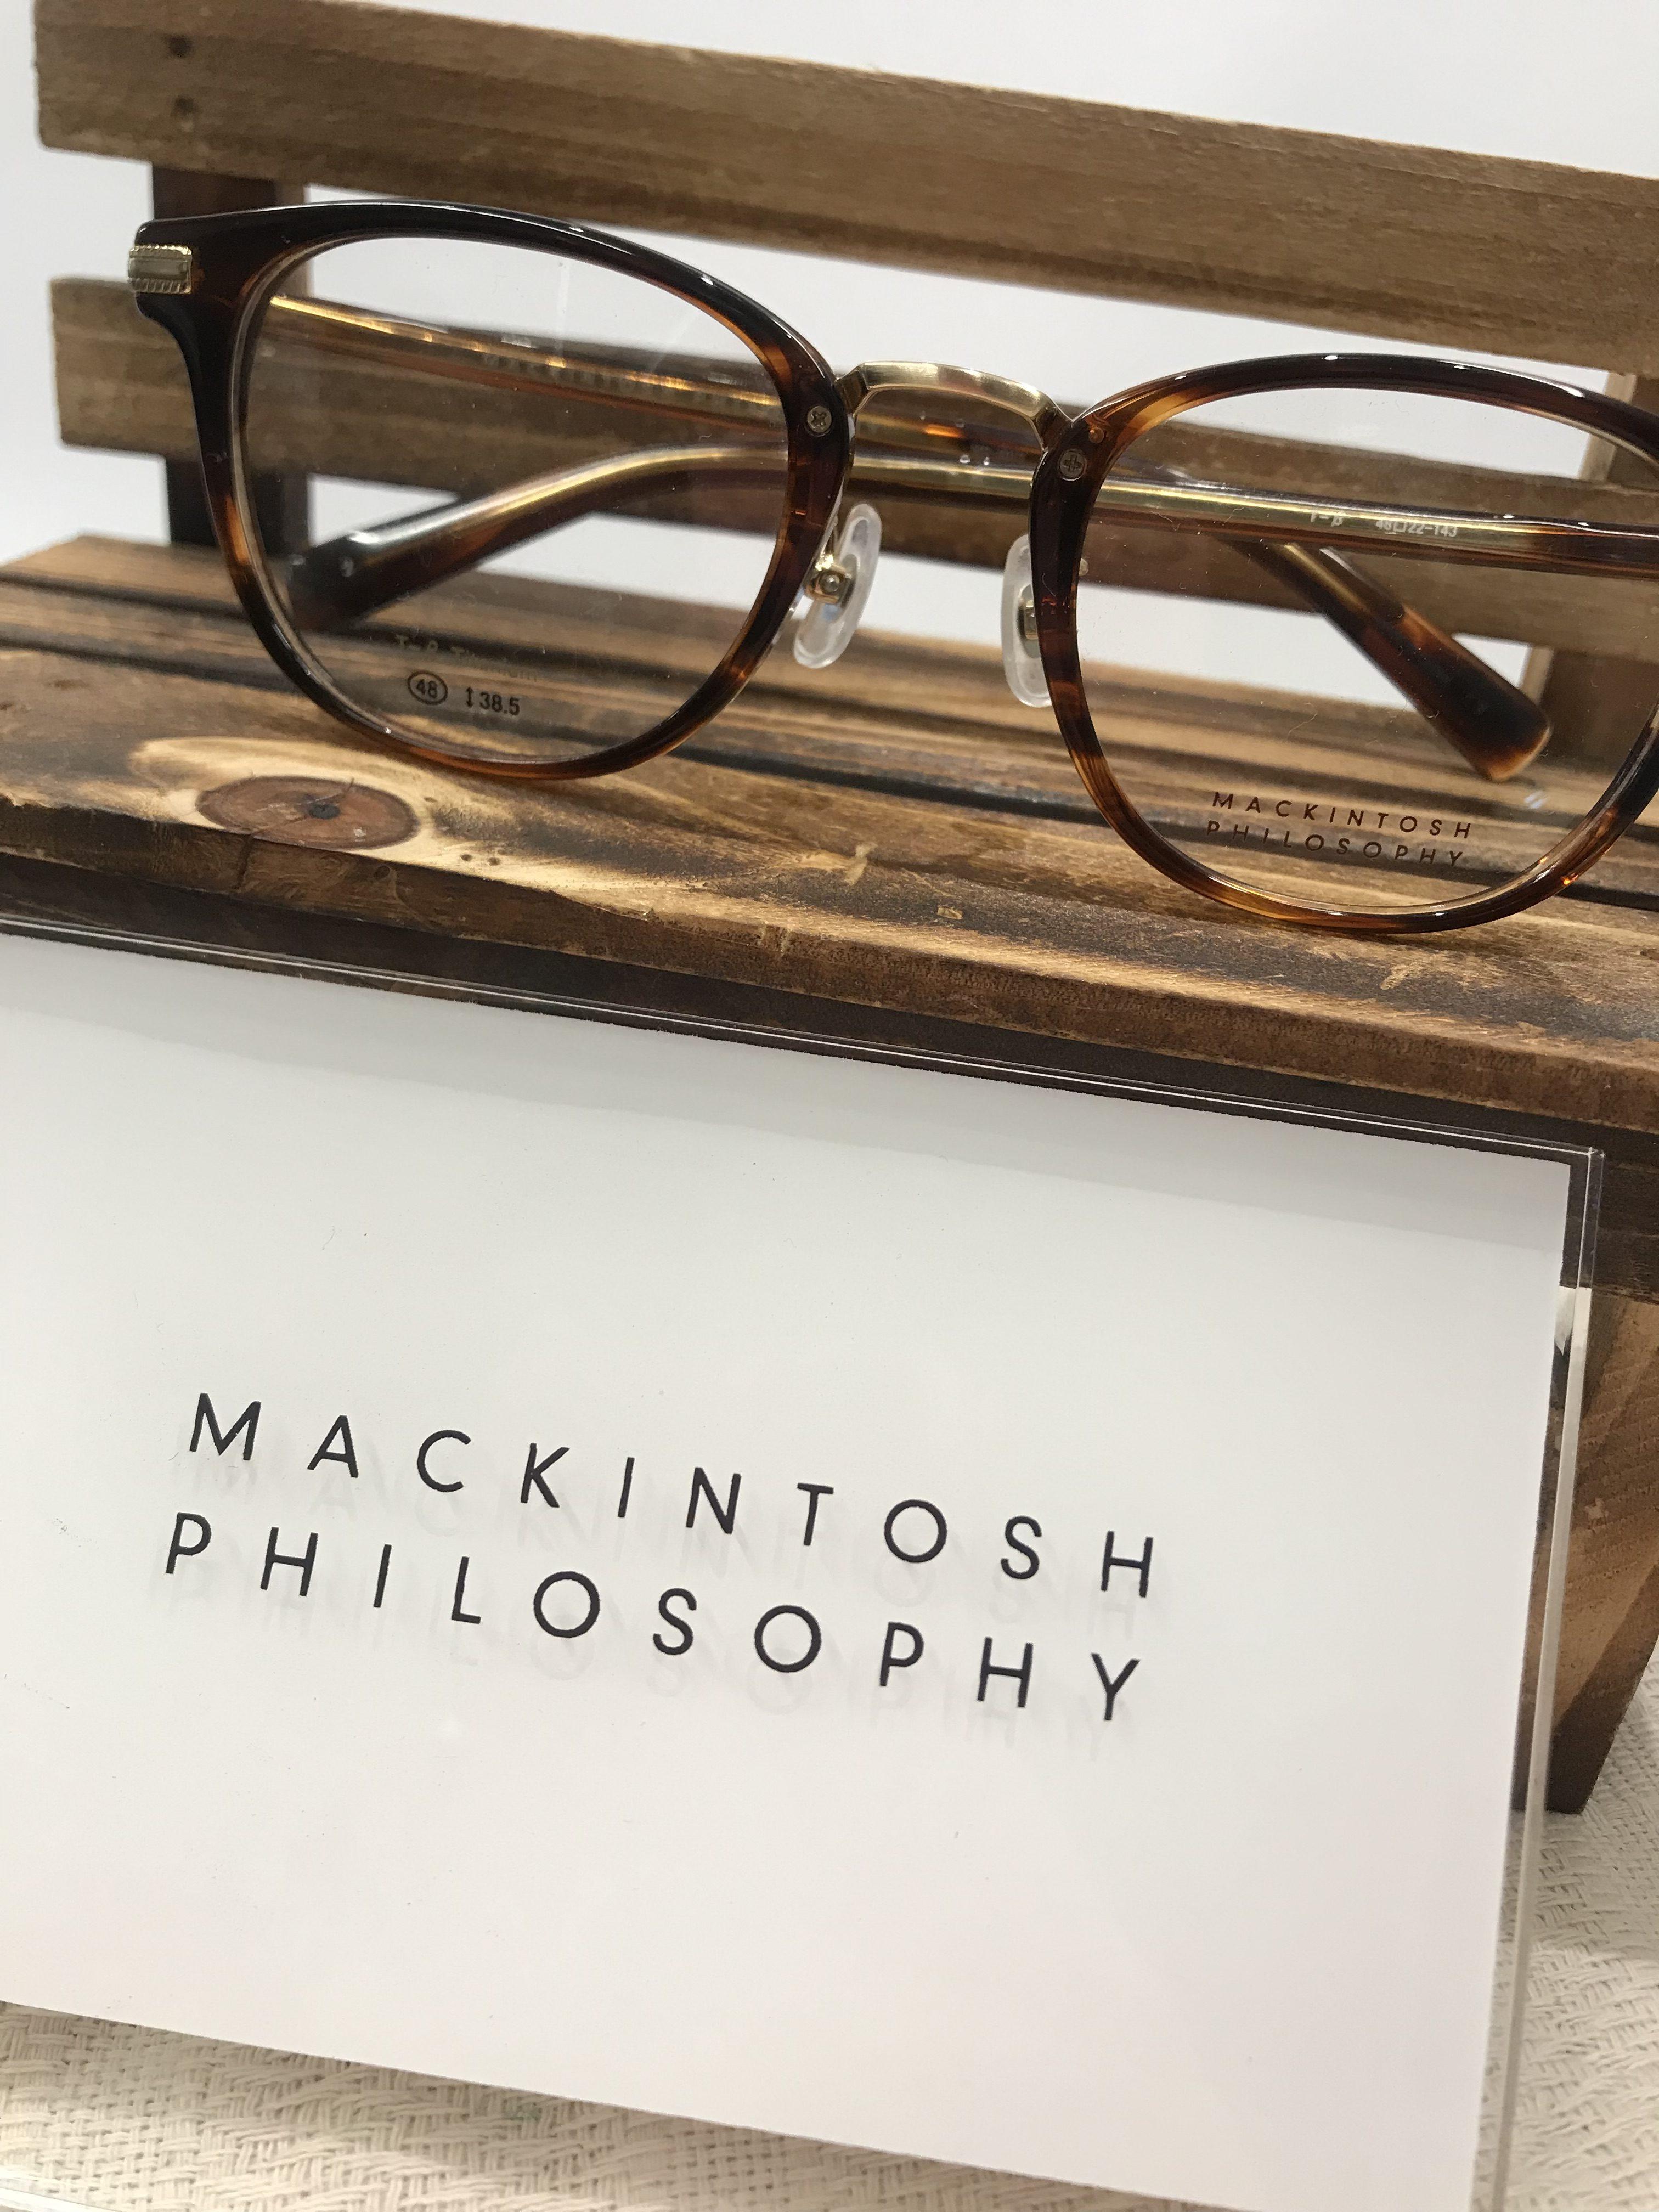 MACKINTOSH PHILOSOPHY(マッキントッシュ フィロソフィー)新しい印象へ!【ルックワン英賀保店】